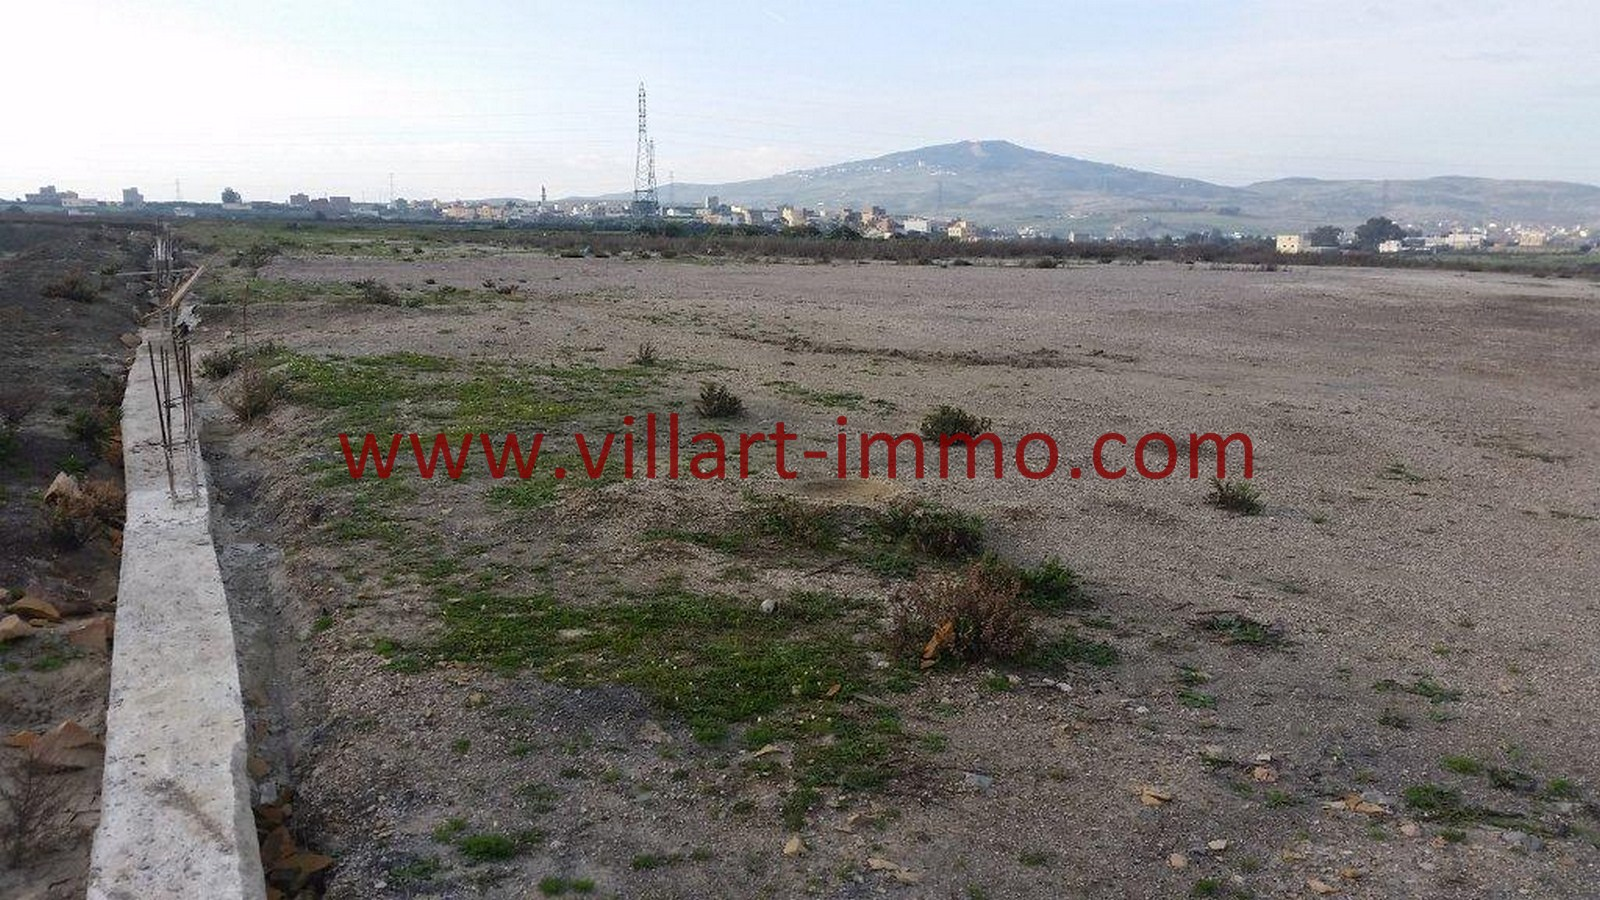 4-Vente-Terrain-Tanger-Meloussa-VT21-Villart Immo